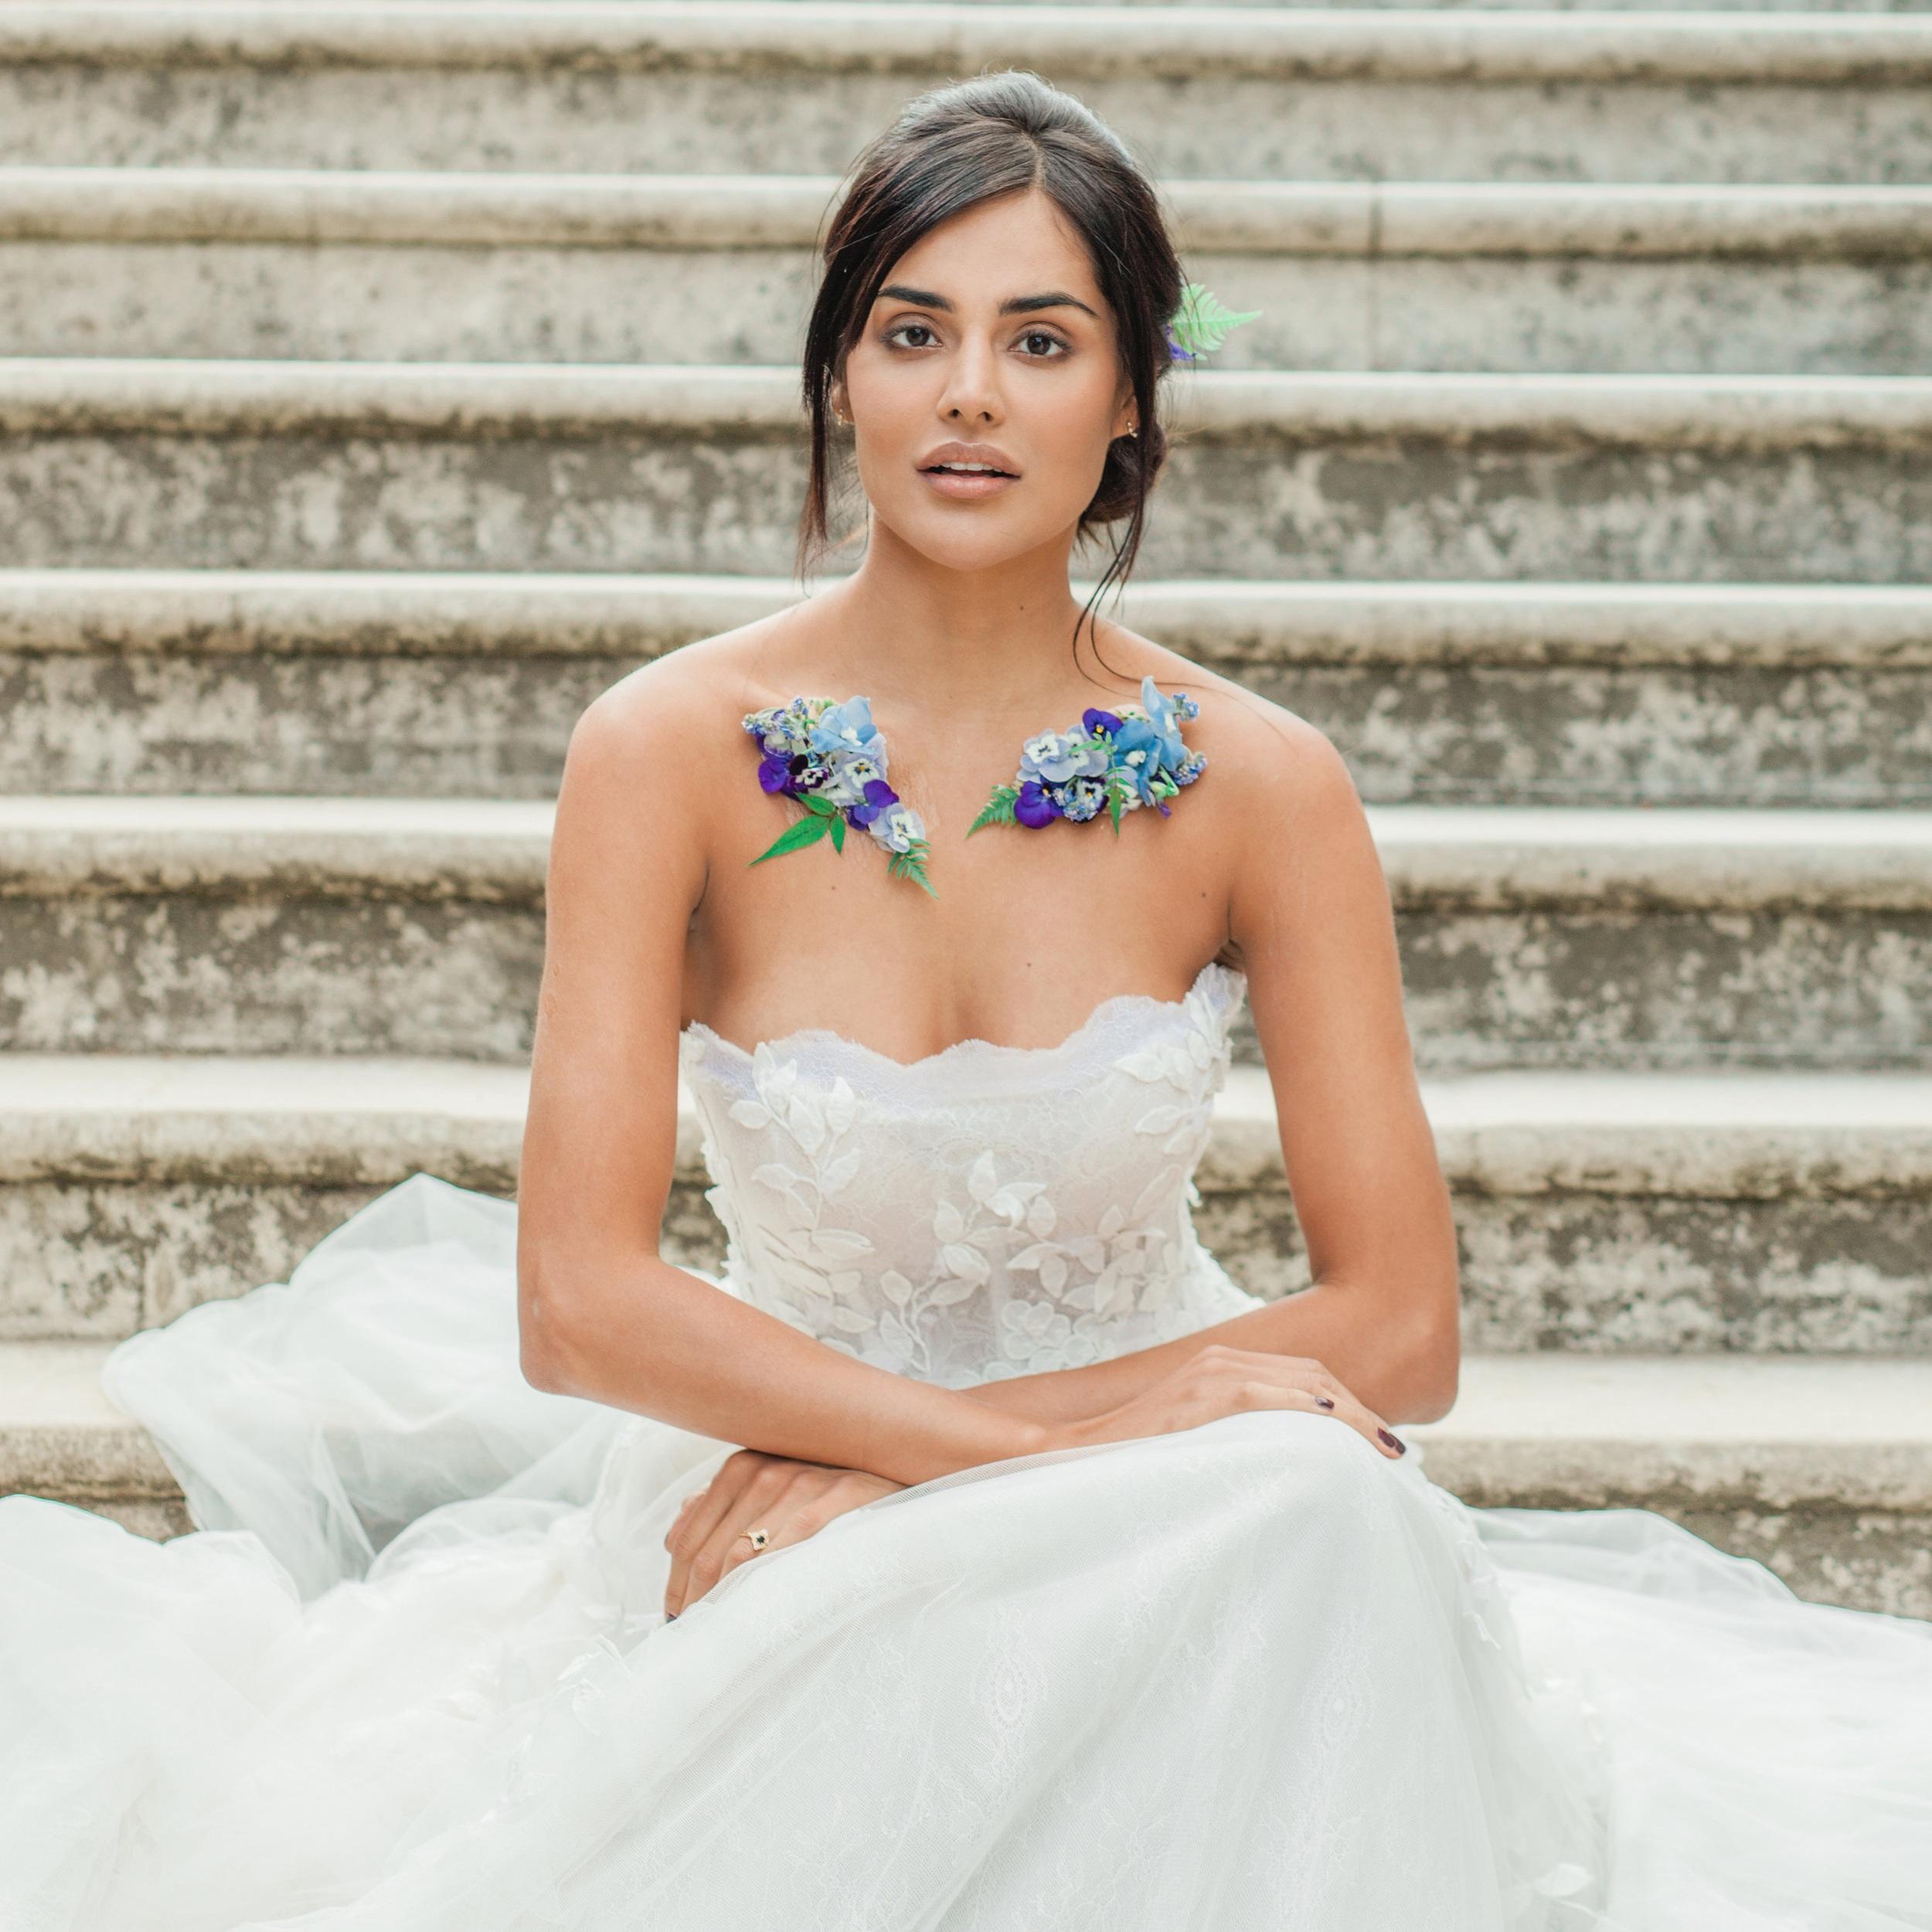 wedding makeup bridal party mother of bride essex london make up artist